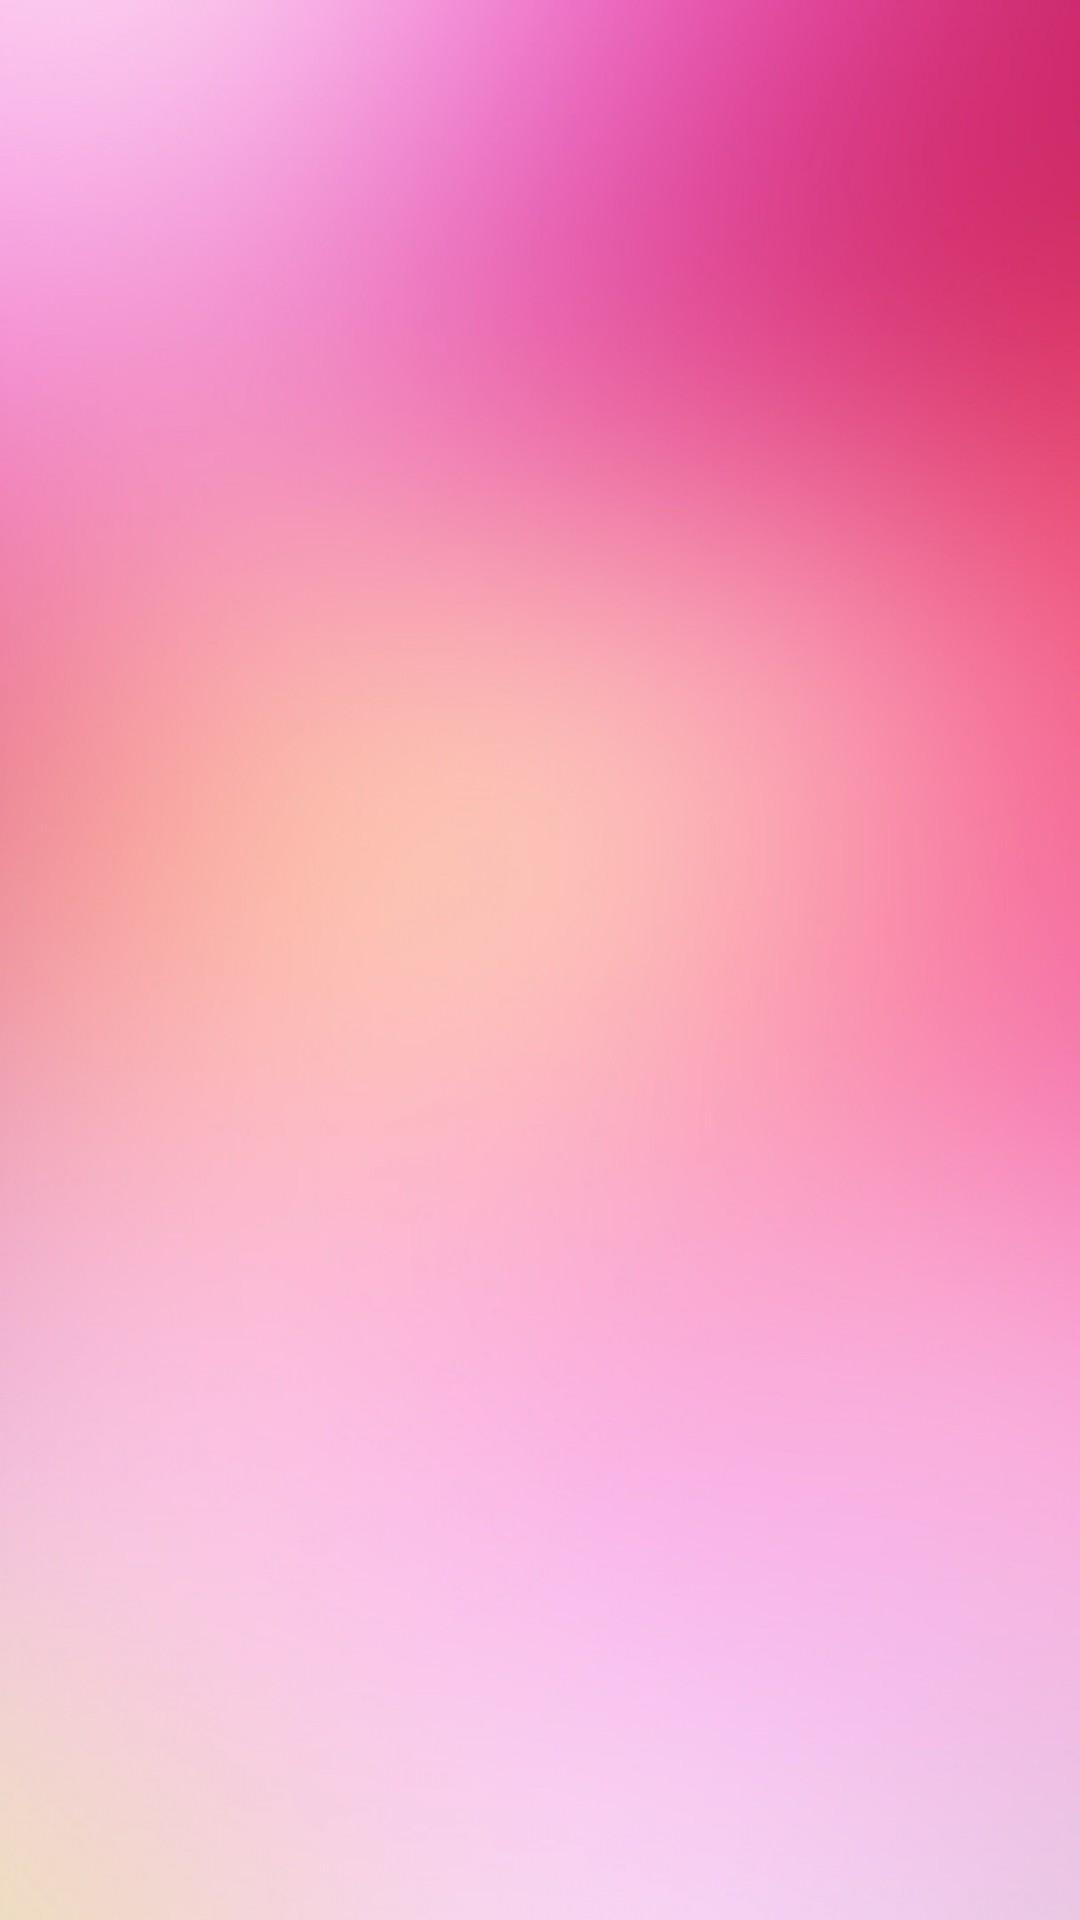 Wallpaper pink, white, light, surface